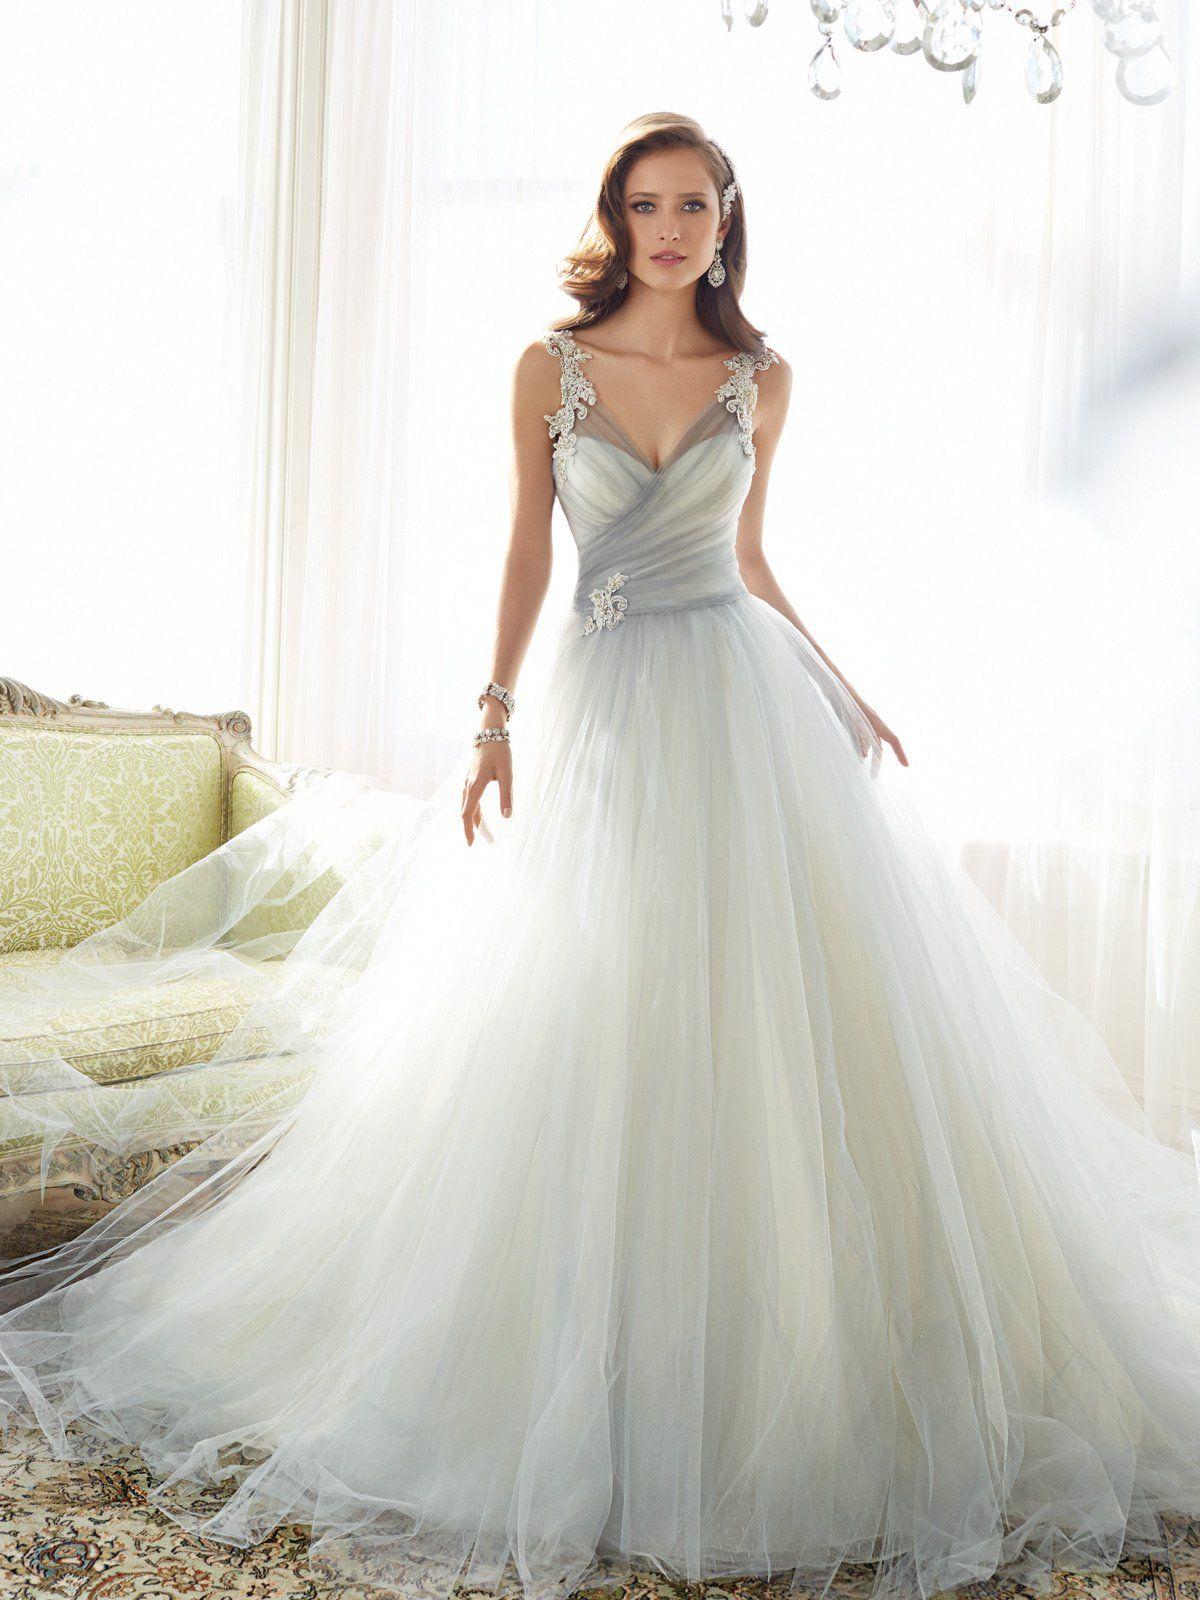 Gray mist soft tulle wedding dress ball gowns pinterest